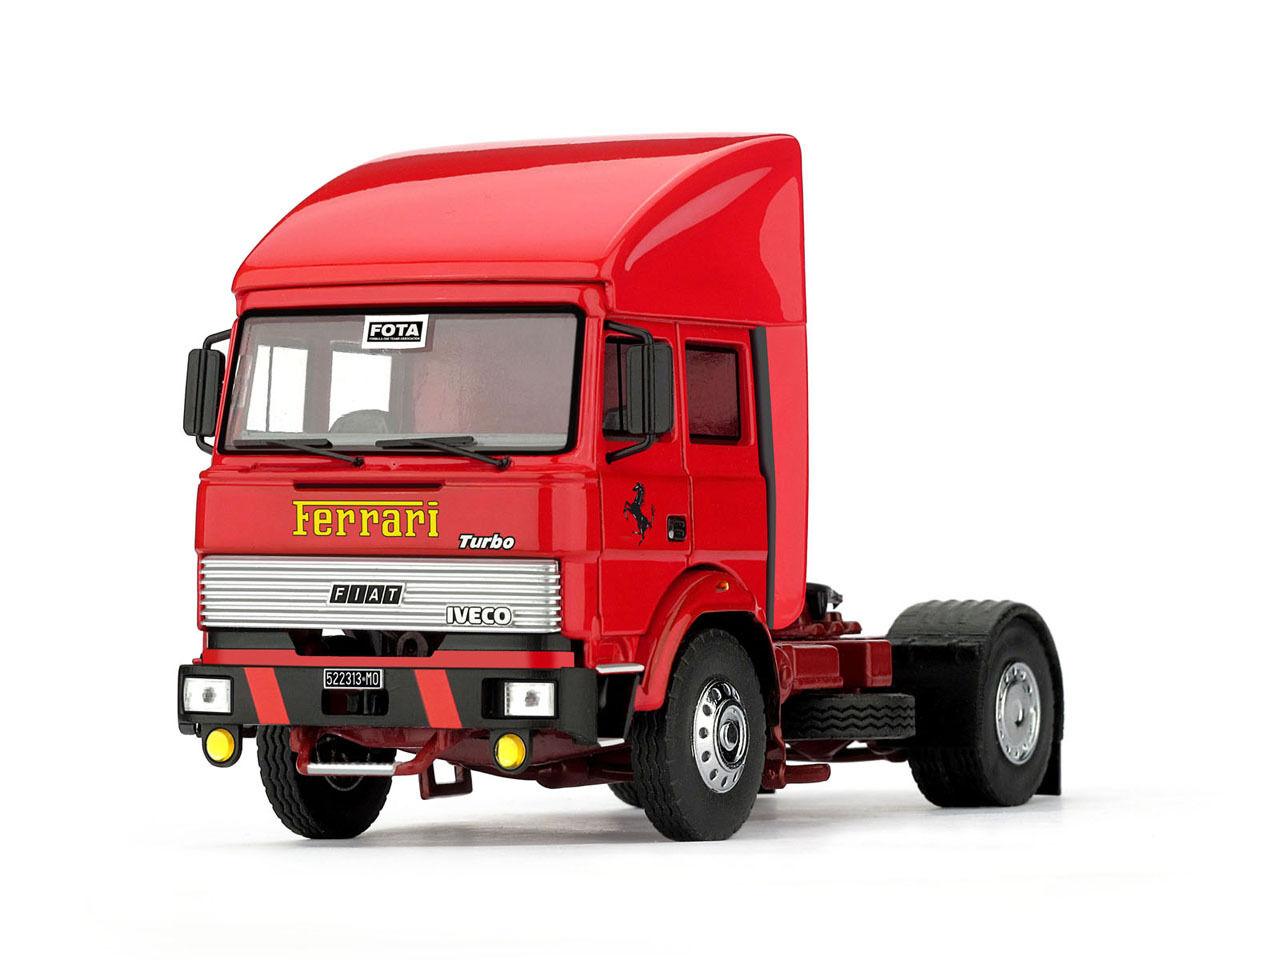 _T05 - Brumm Fiat Iveco 190 - röta - Scuderia Ferrari - 1982 - 1 43